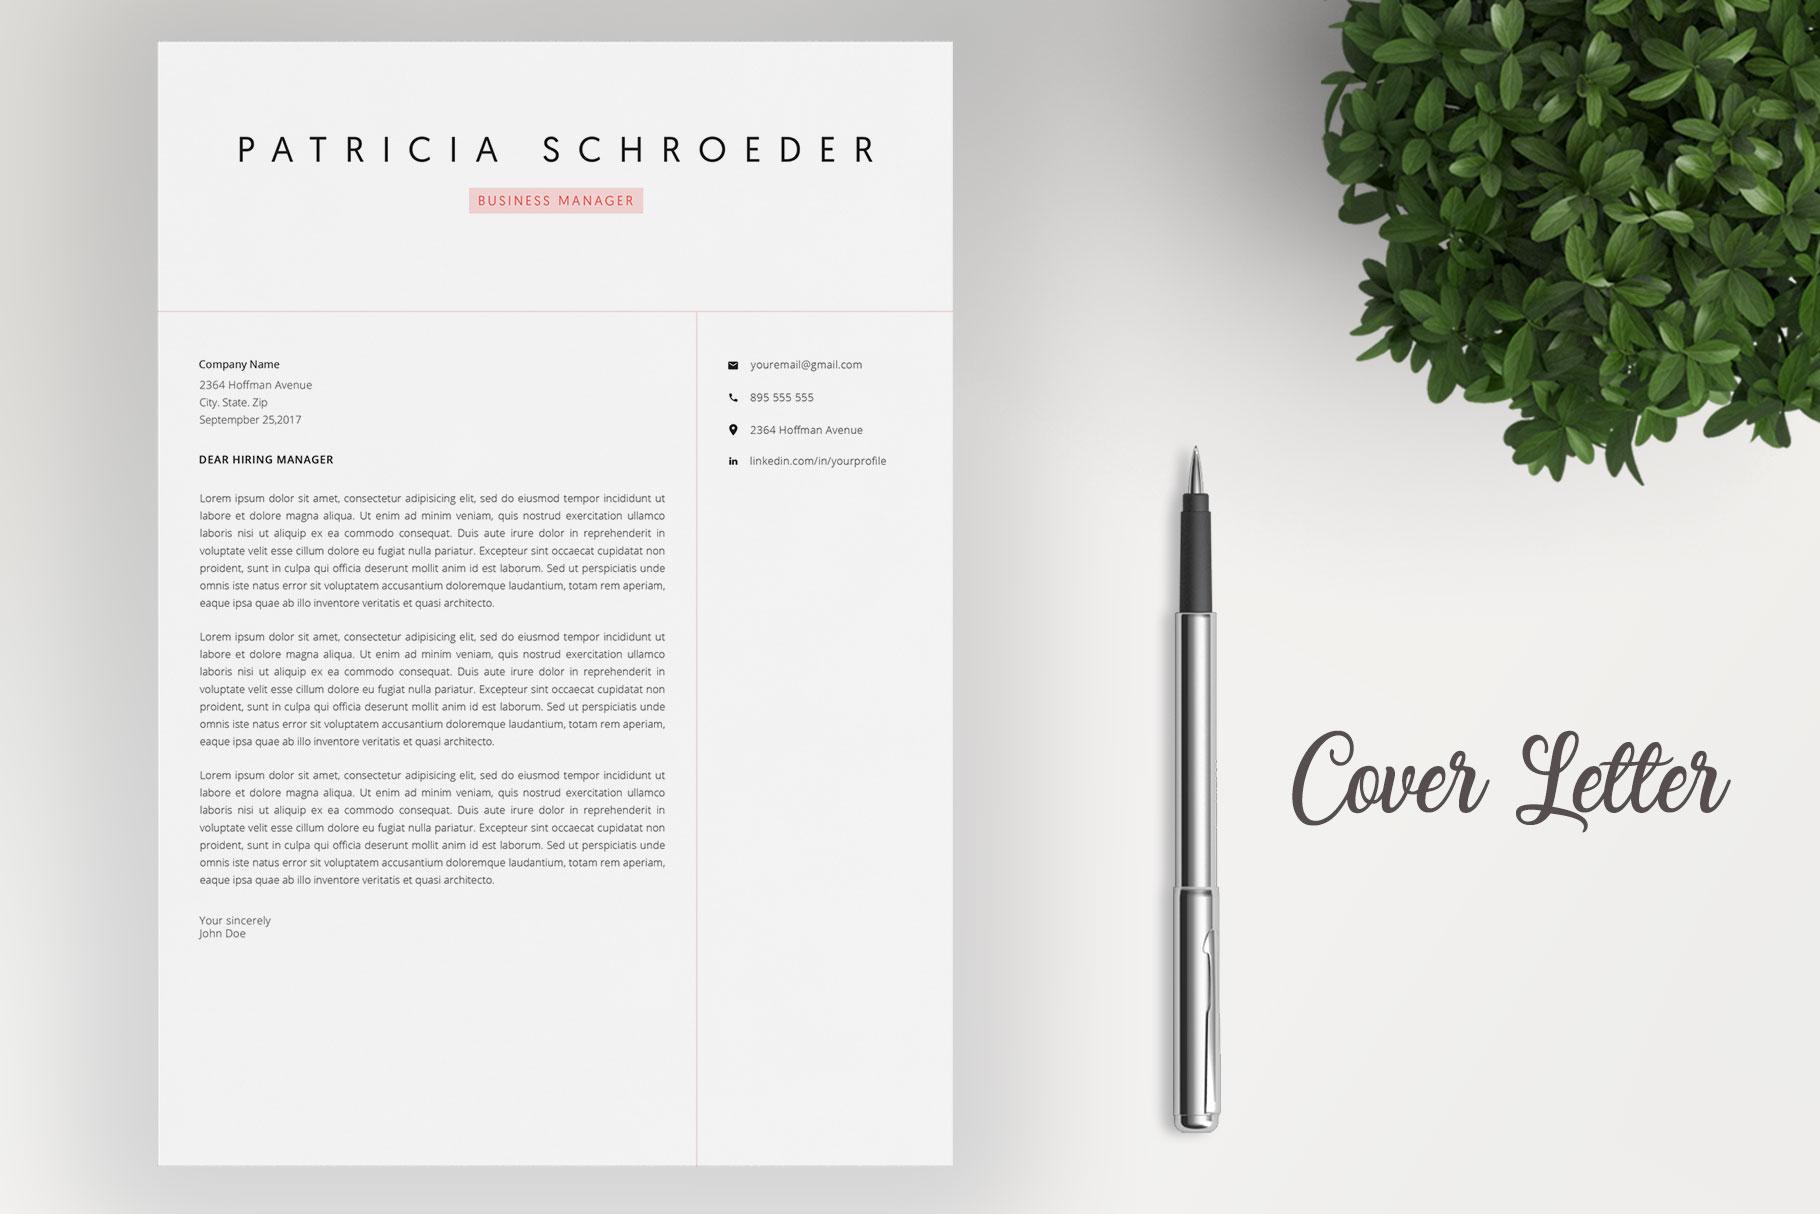 Elegant Resume | Word Resume | Cover Letter example image 4